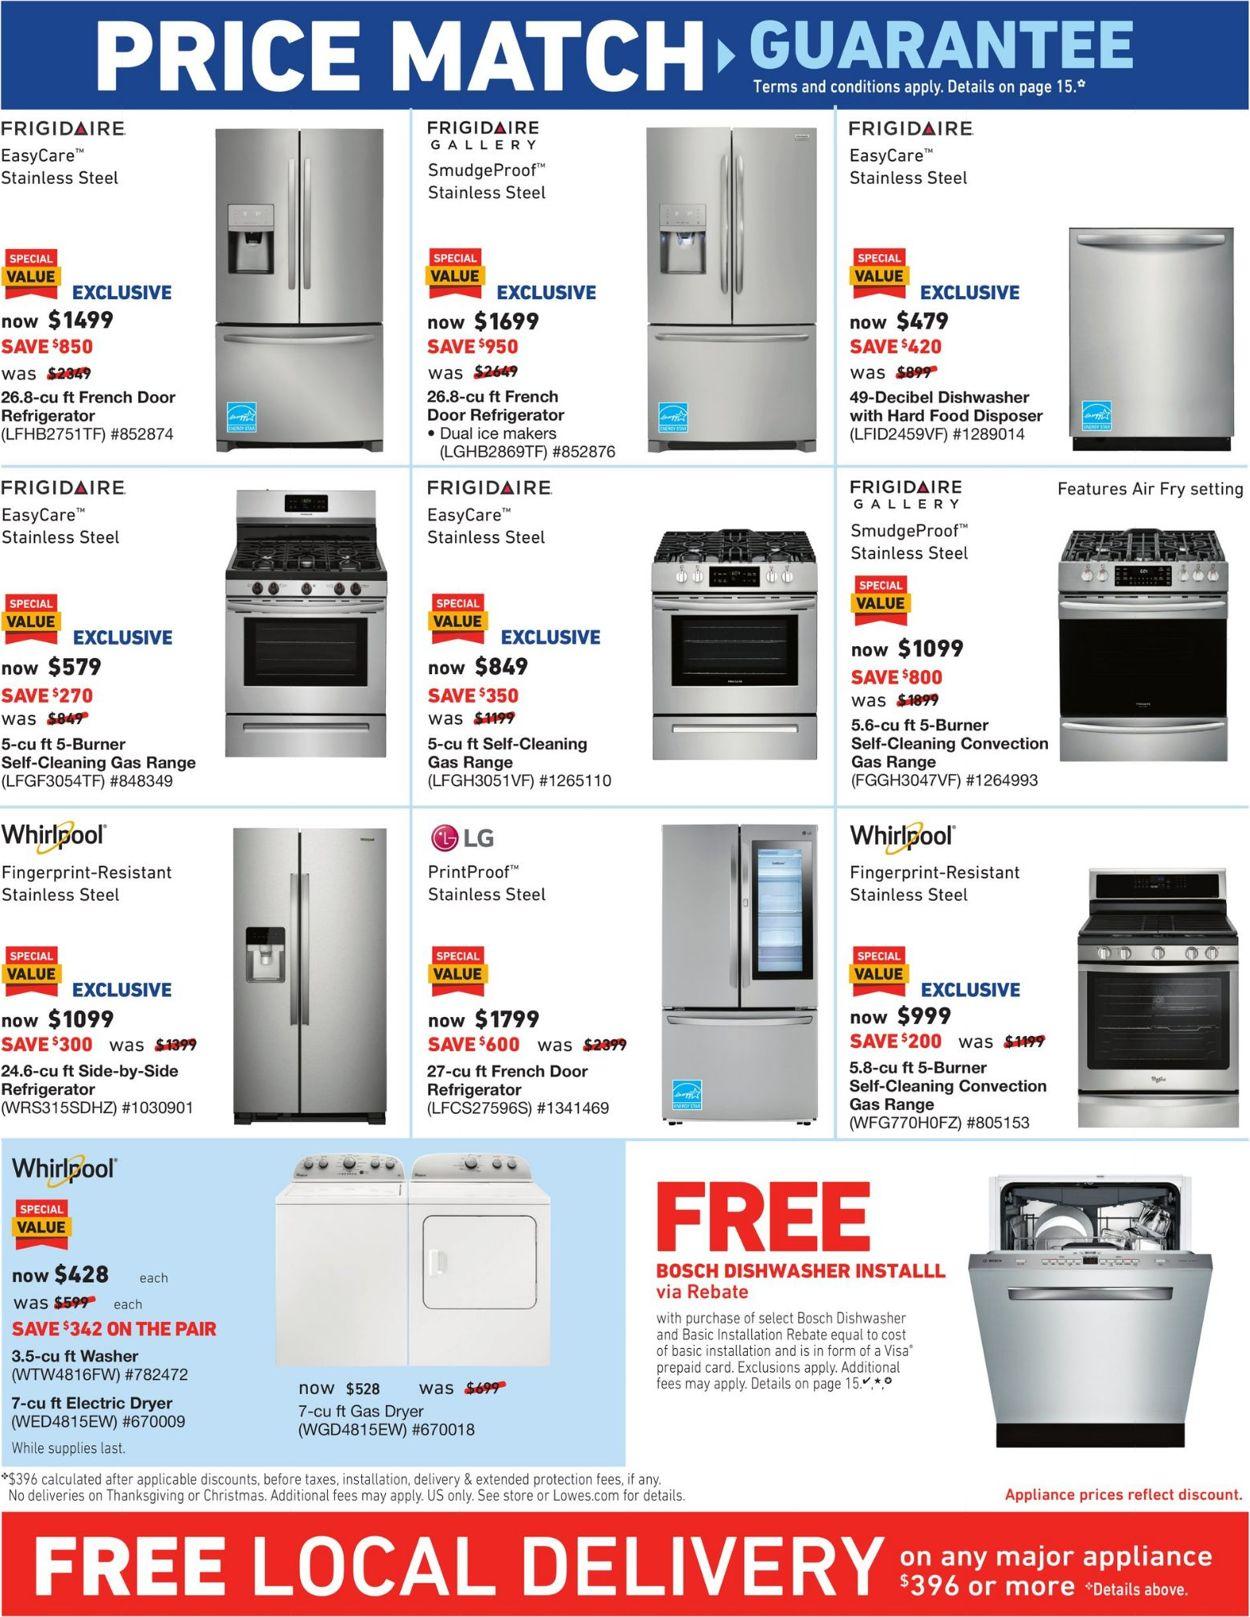 Bosch Dishwasher Free Installation : bosch, dishwasher, installation, Lowe's, Current, Weekly, 10/10, 10/16/2019, Frequent-ads.com